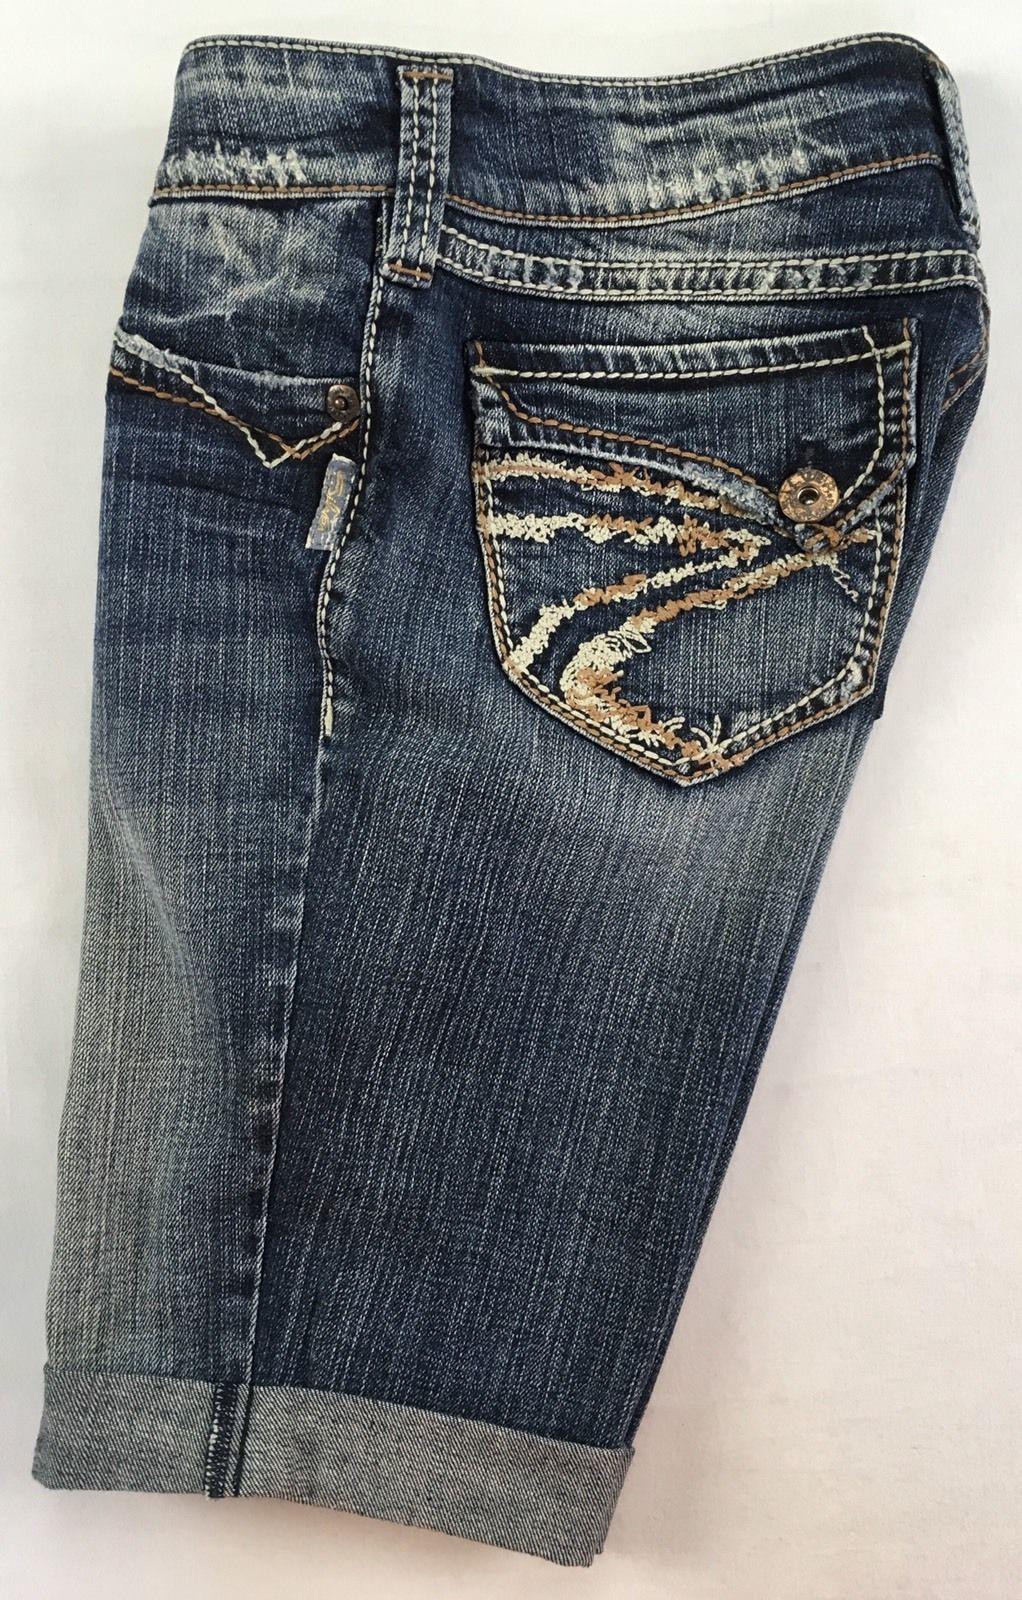 SILVER Jeans Sale Buckle Mid Rise Suki Flap Surplus Denim Jean Stretch Shorts 28